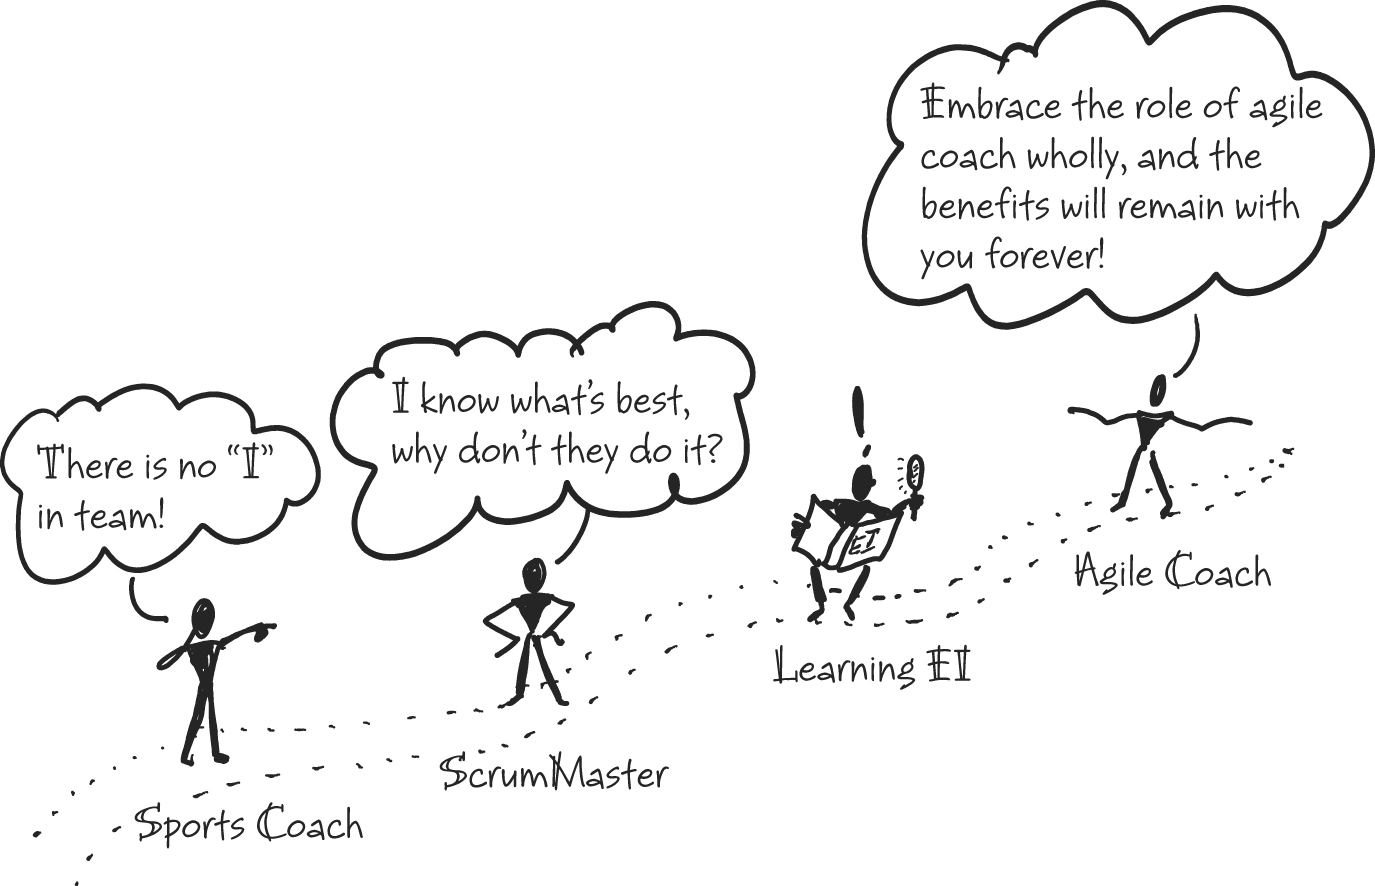 Martin Kearns' Agile Coach Journey from the Coaching Agile Teams book. Illustration copyright 2010 Pearson Education